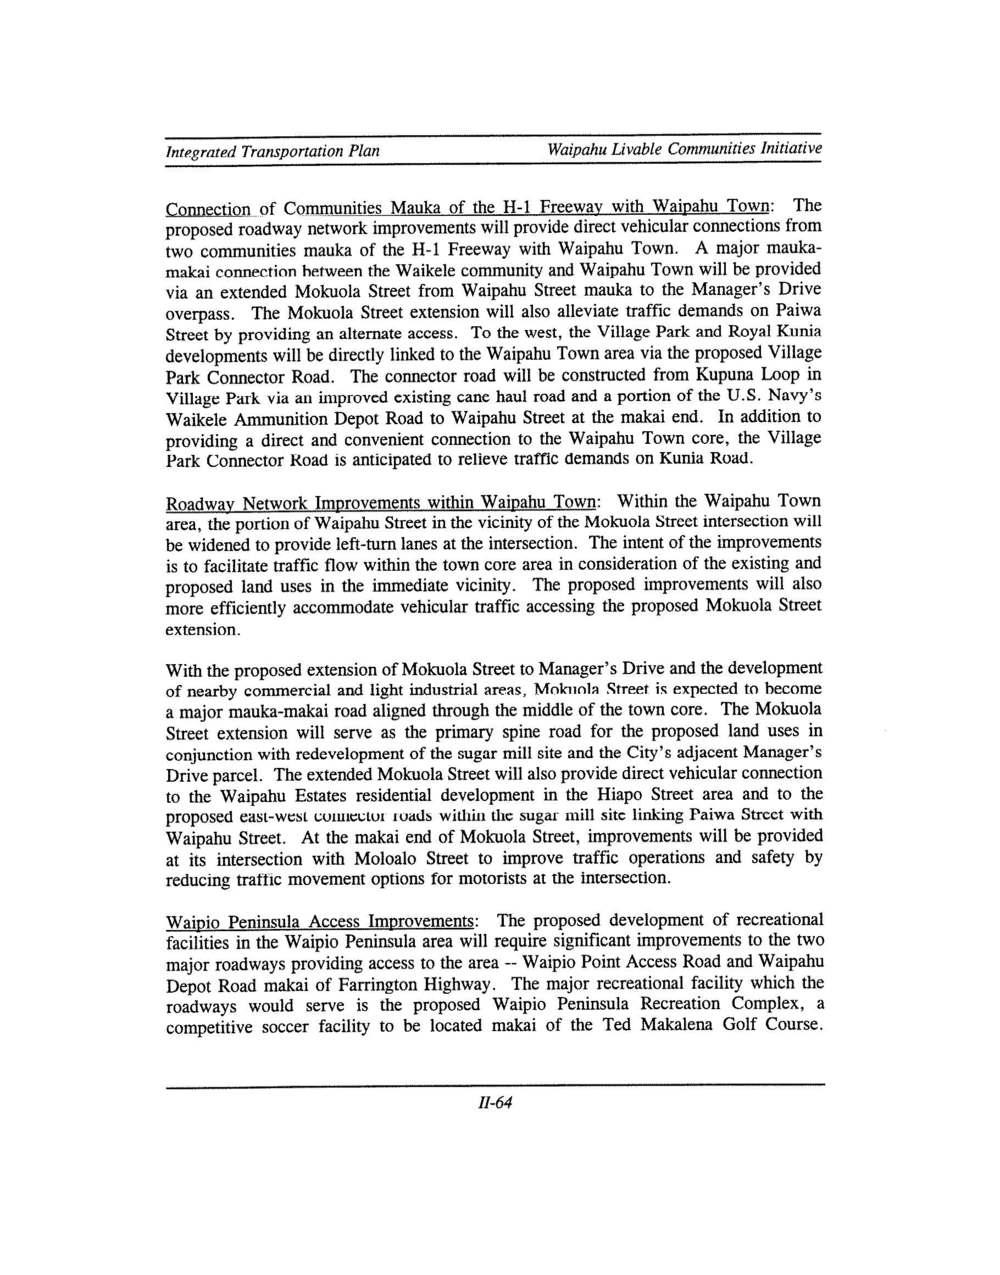 160531_WaipahuLivableCommunities(1998)_Page_079.jpg